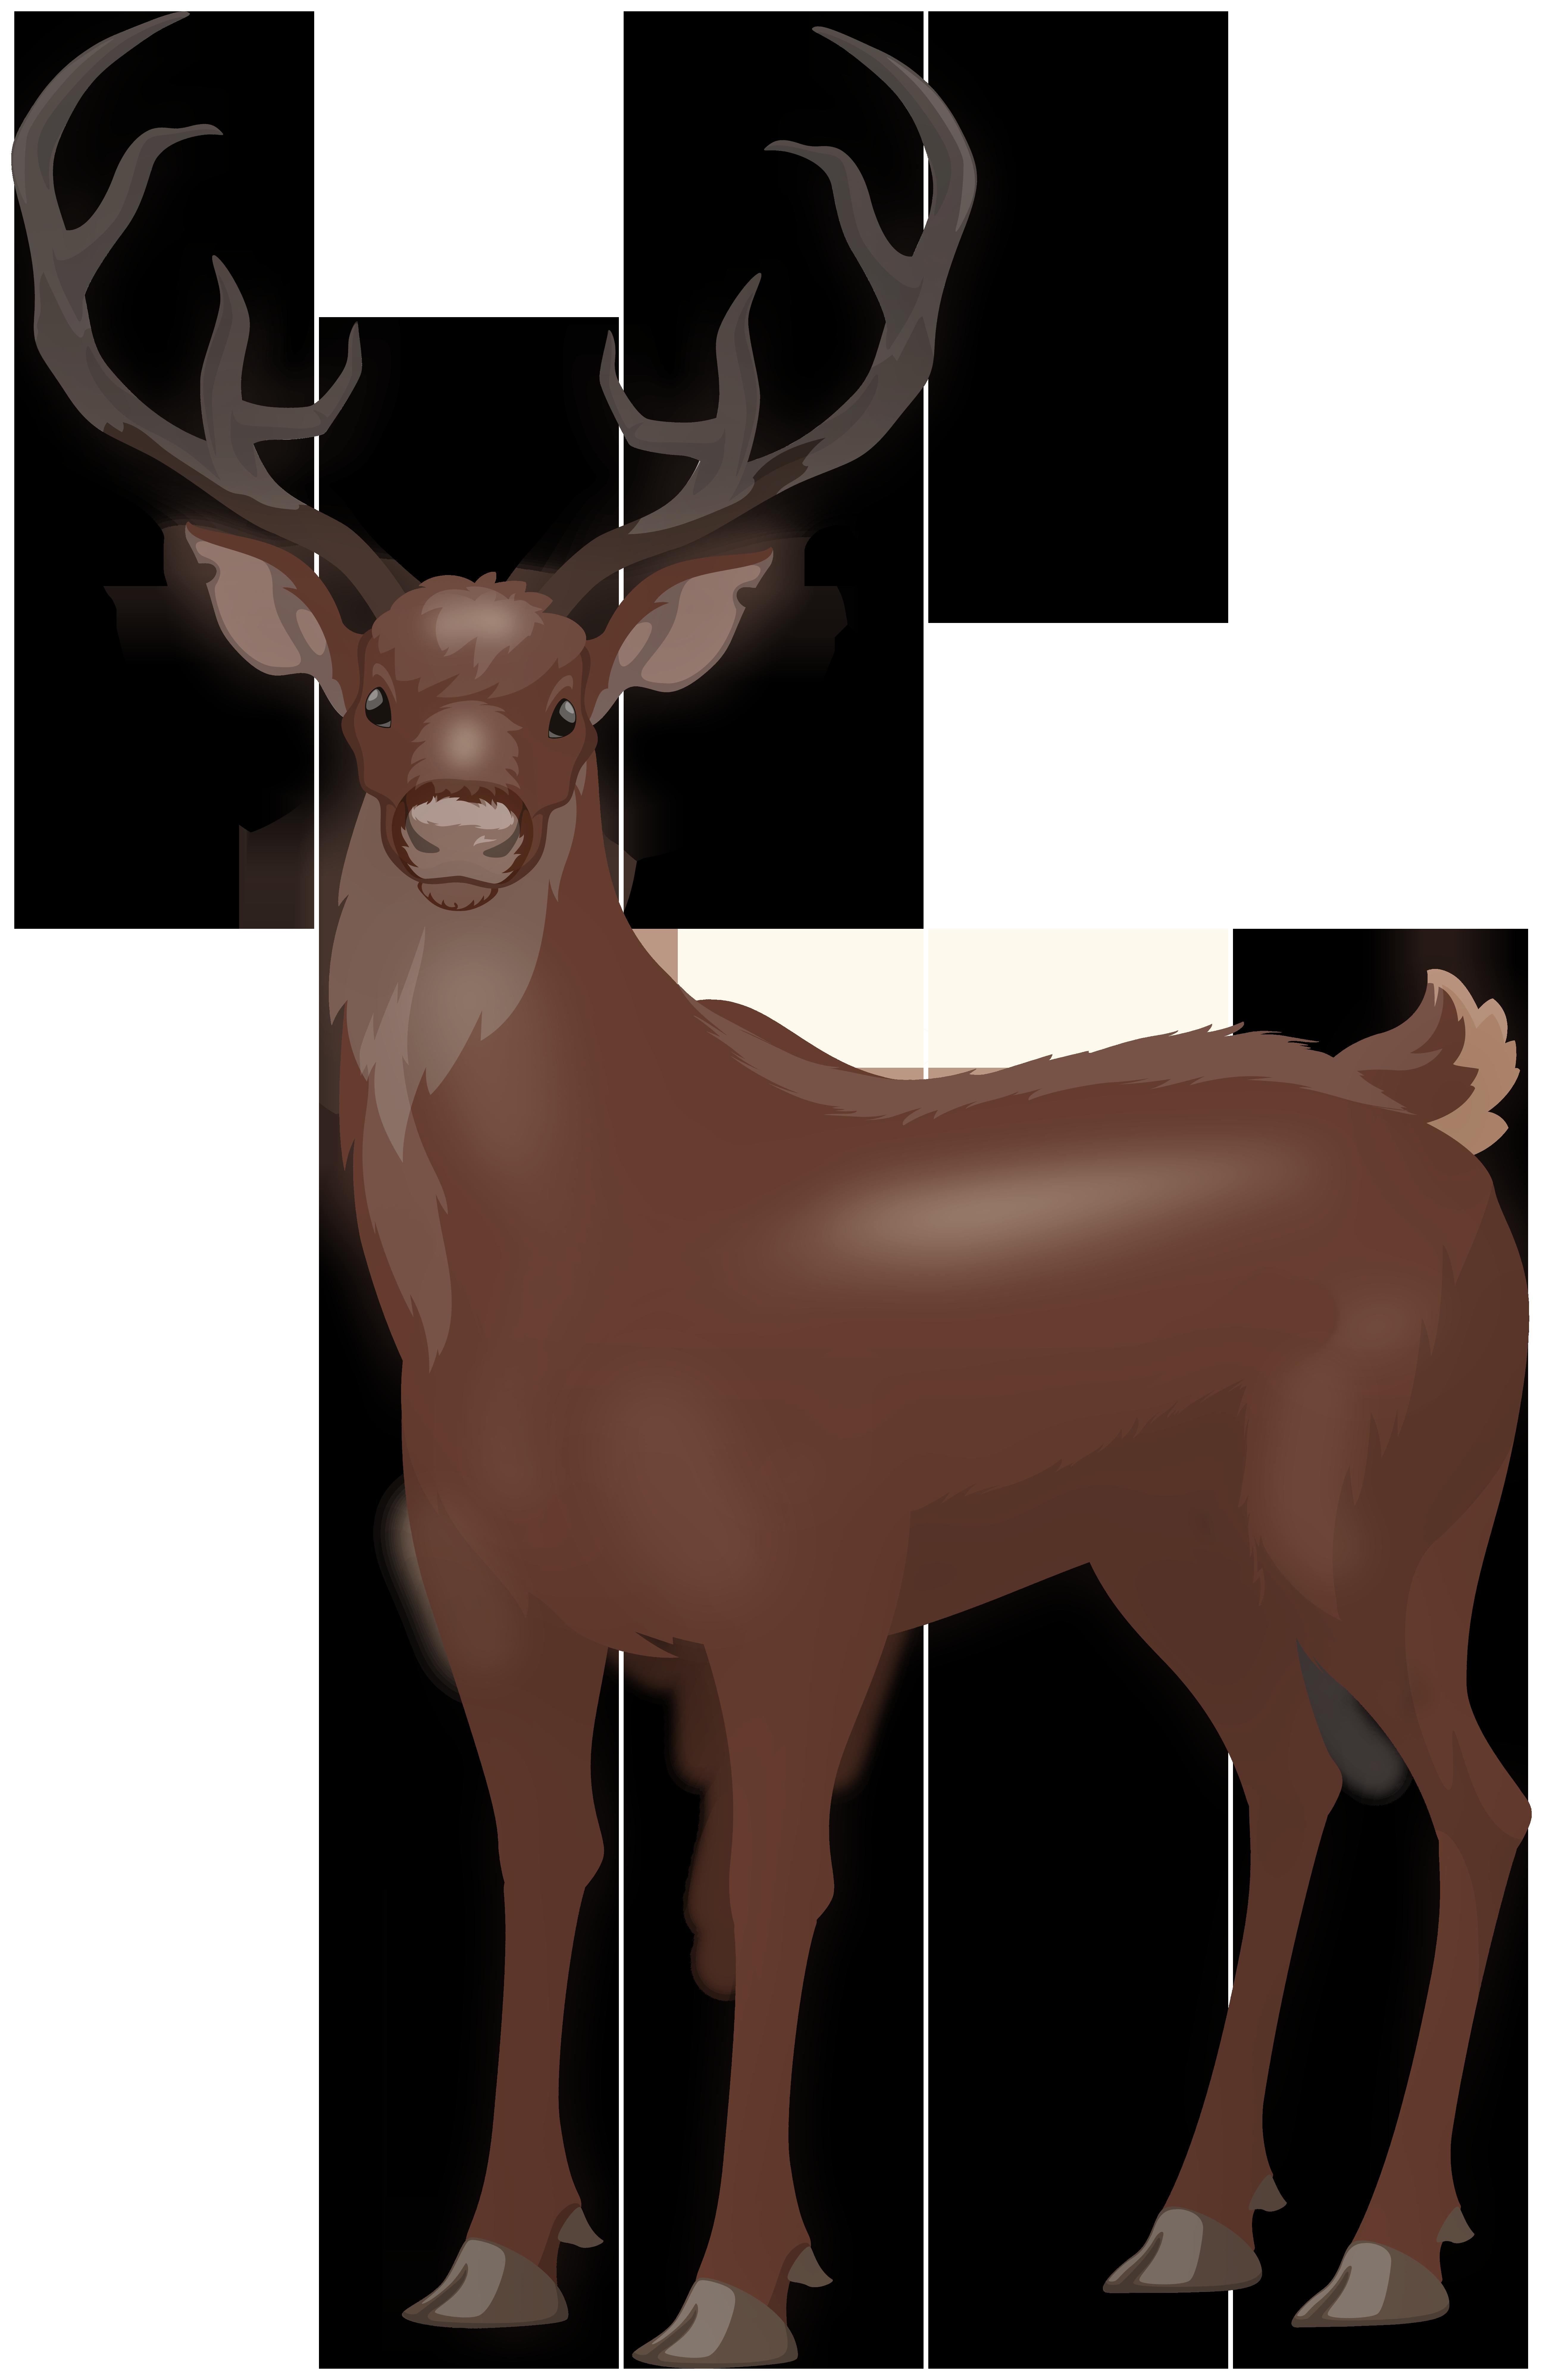 Red Deer Stag PNG Clip Art Image.